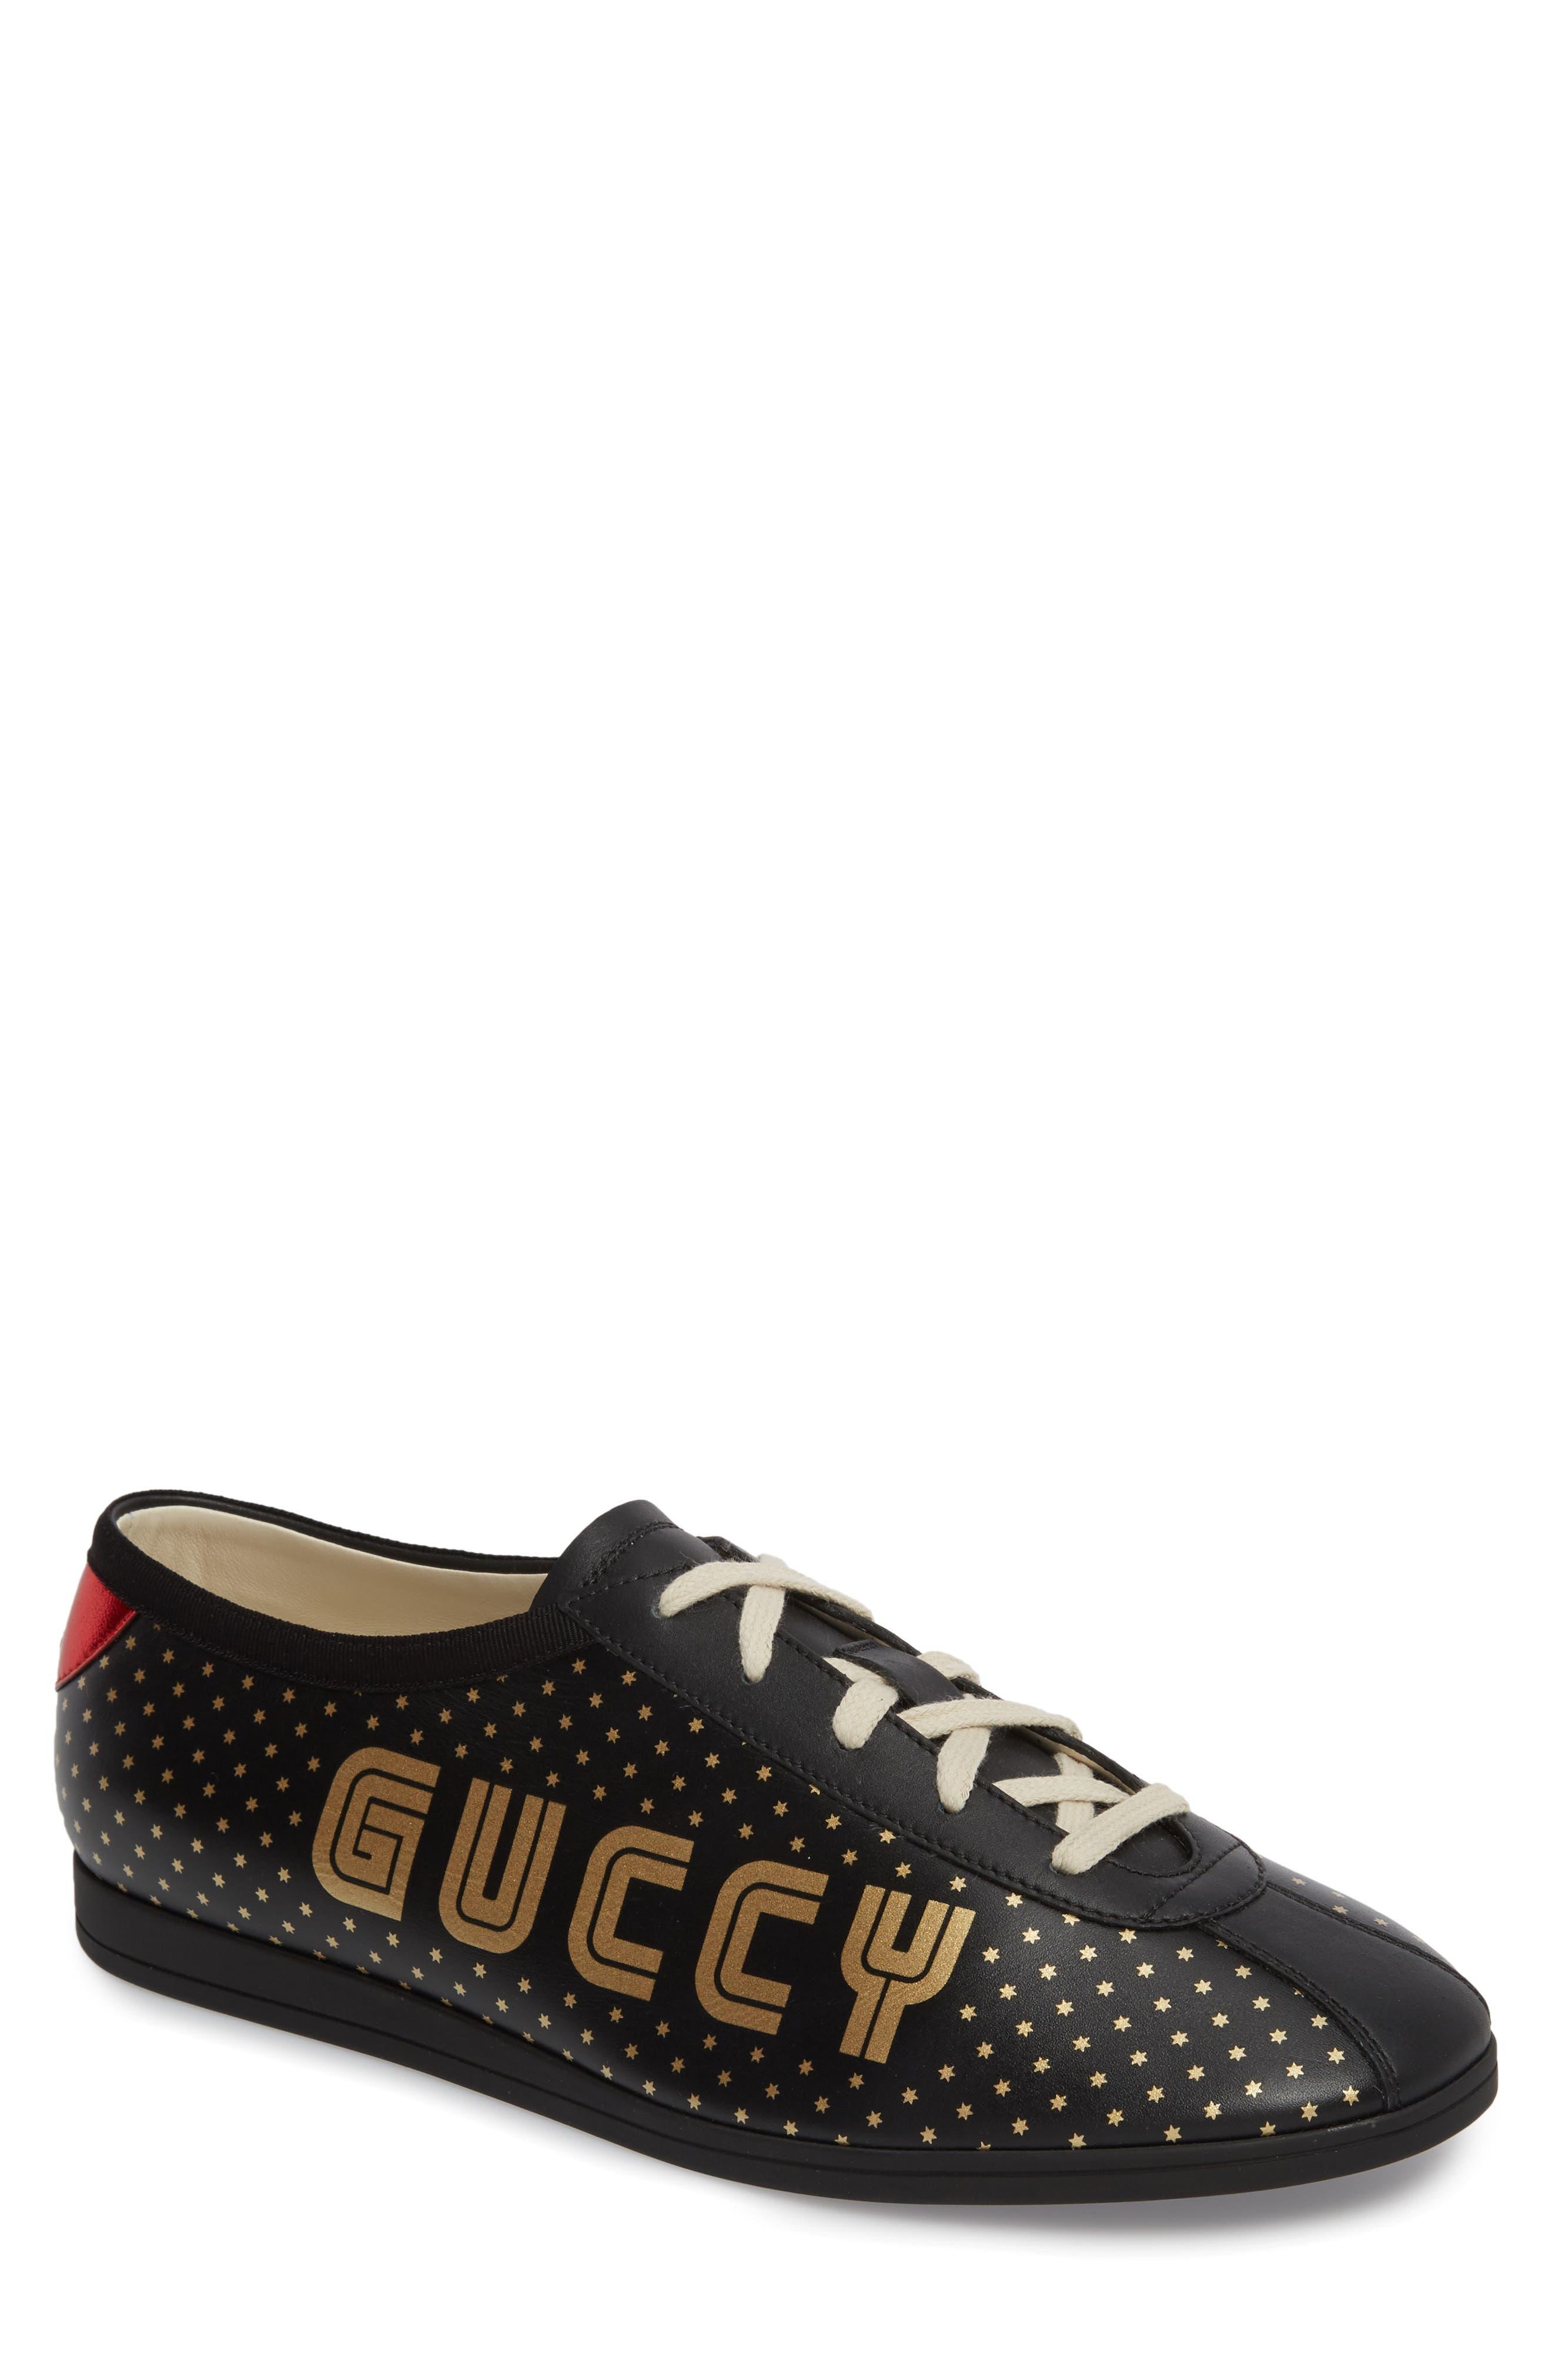 Falacer Guccy Print Sneaker,                         Main,                         color, BLACK/ TAN